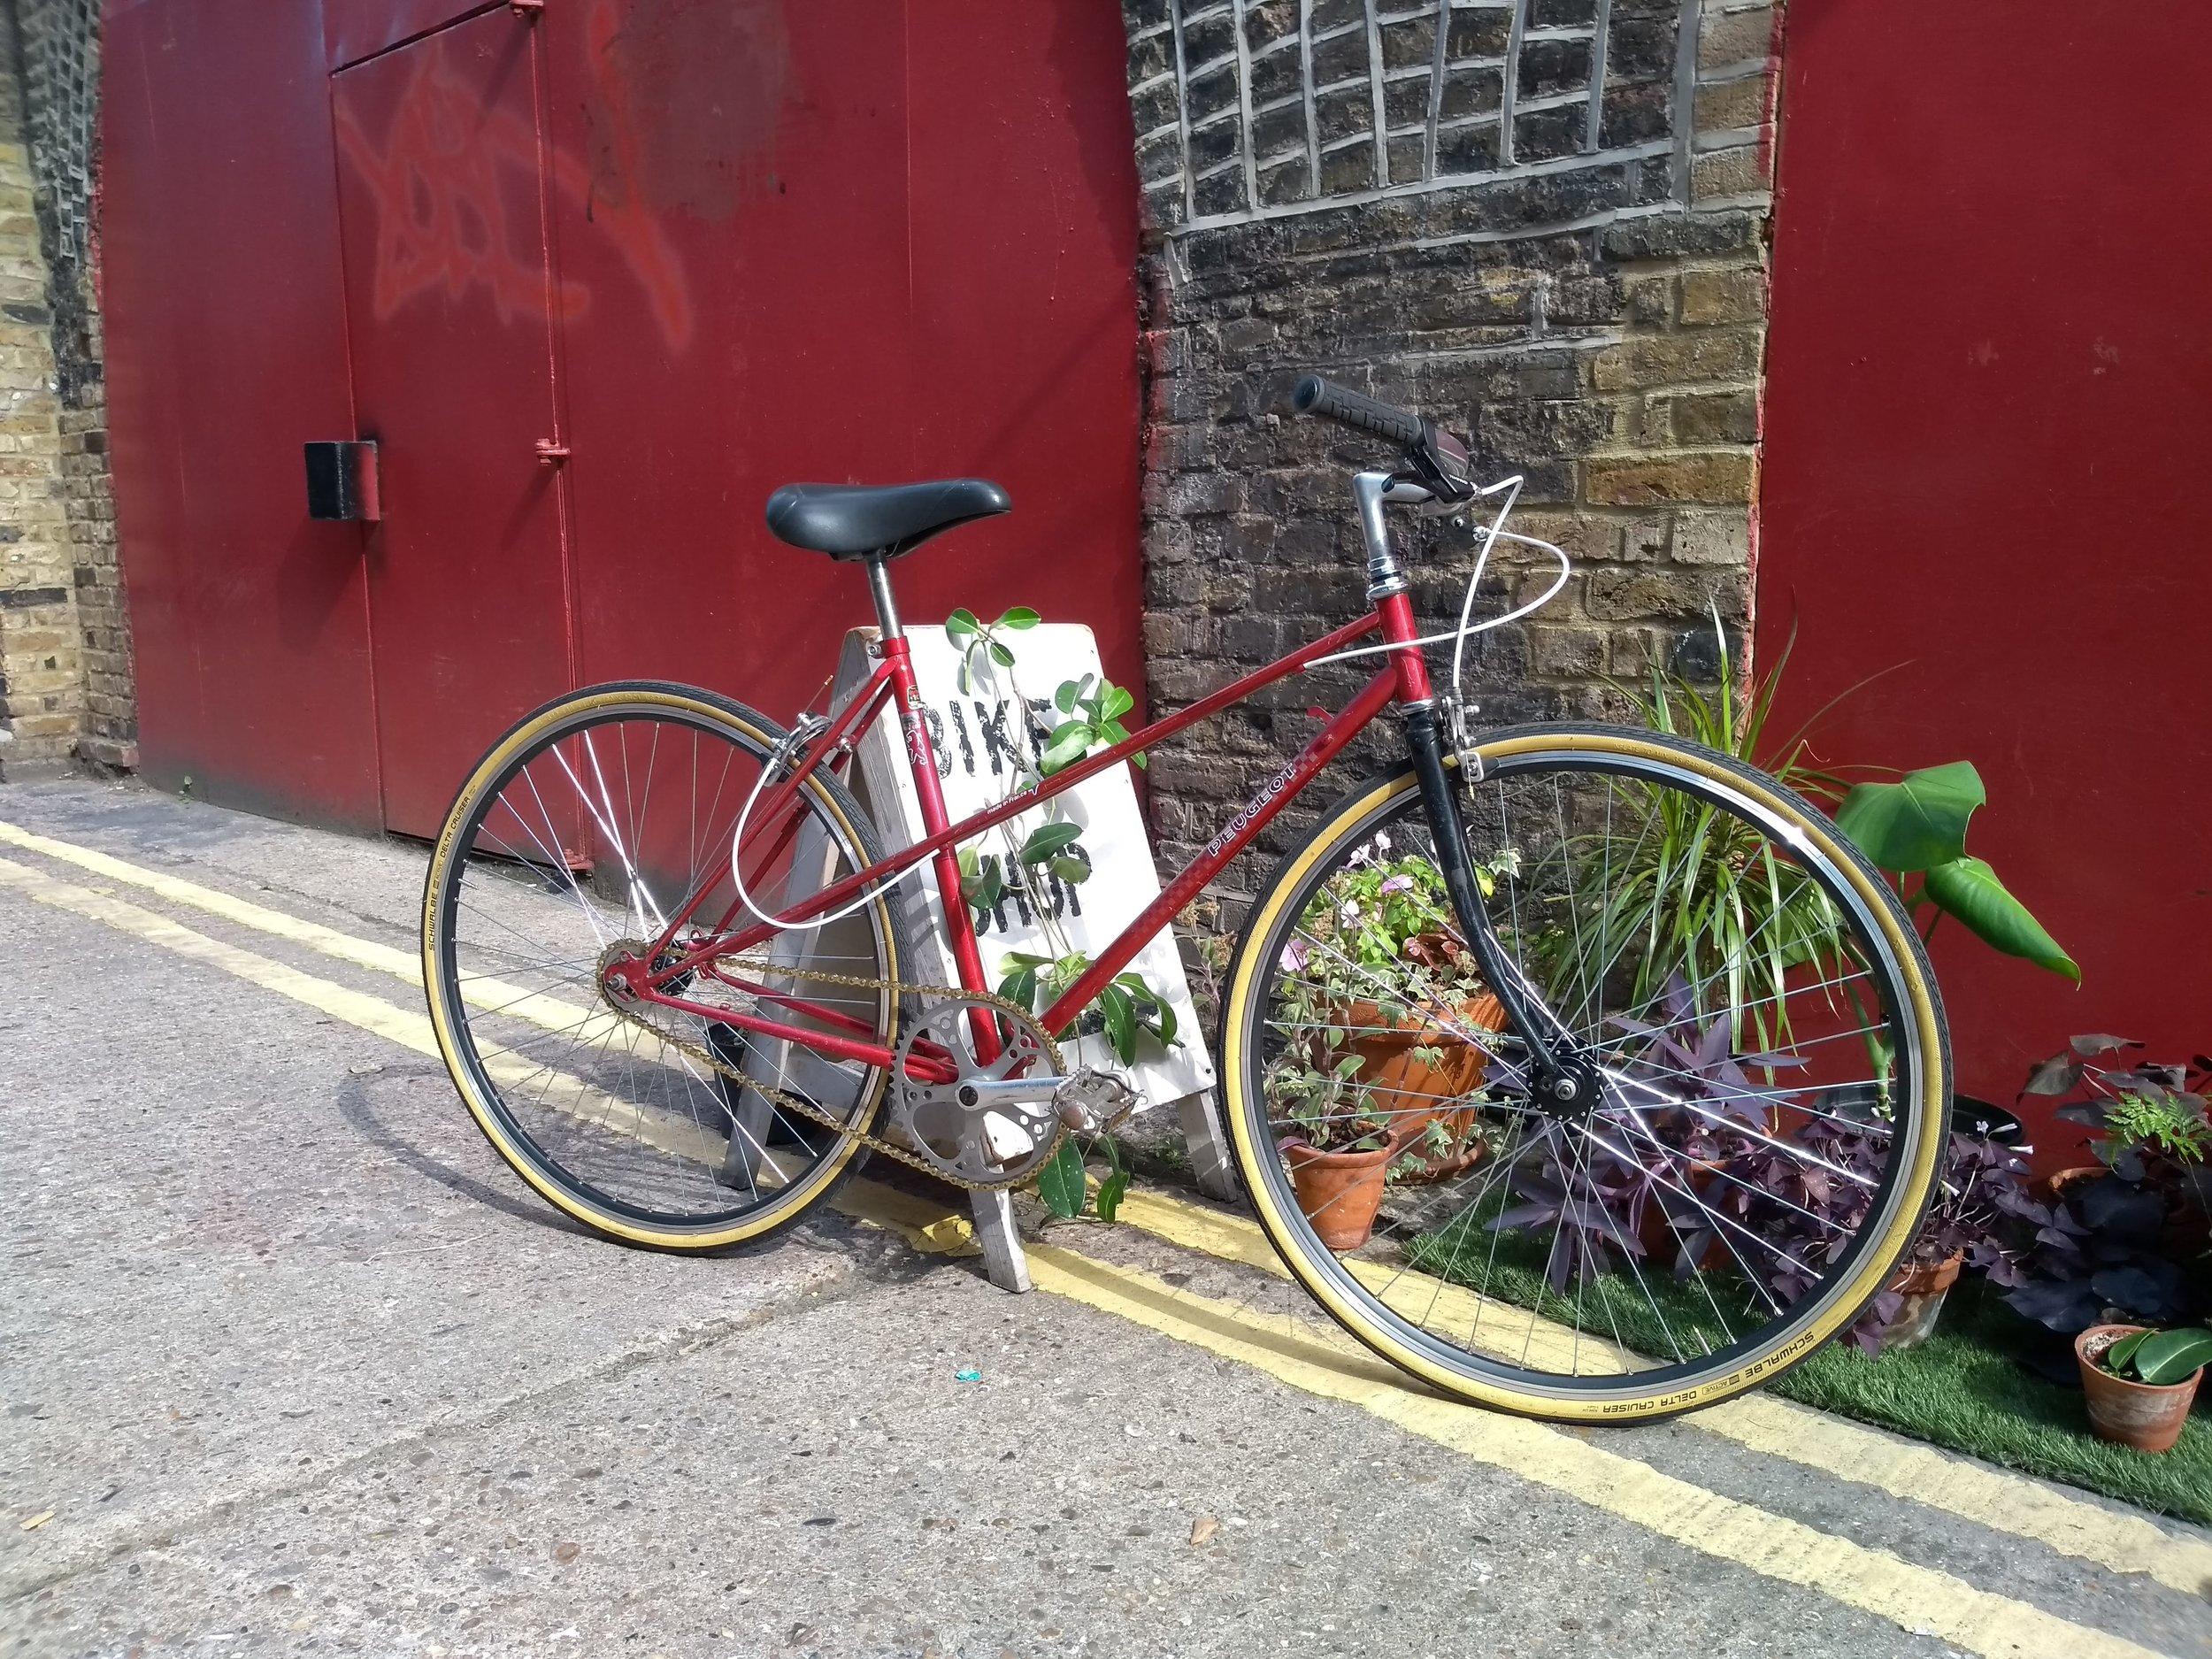 East London bike shop